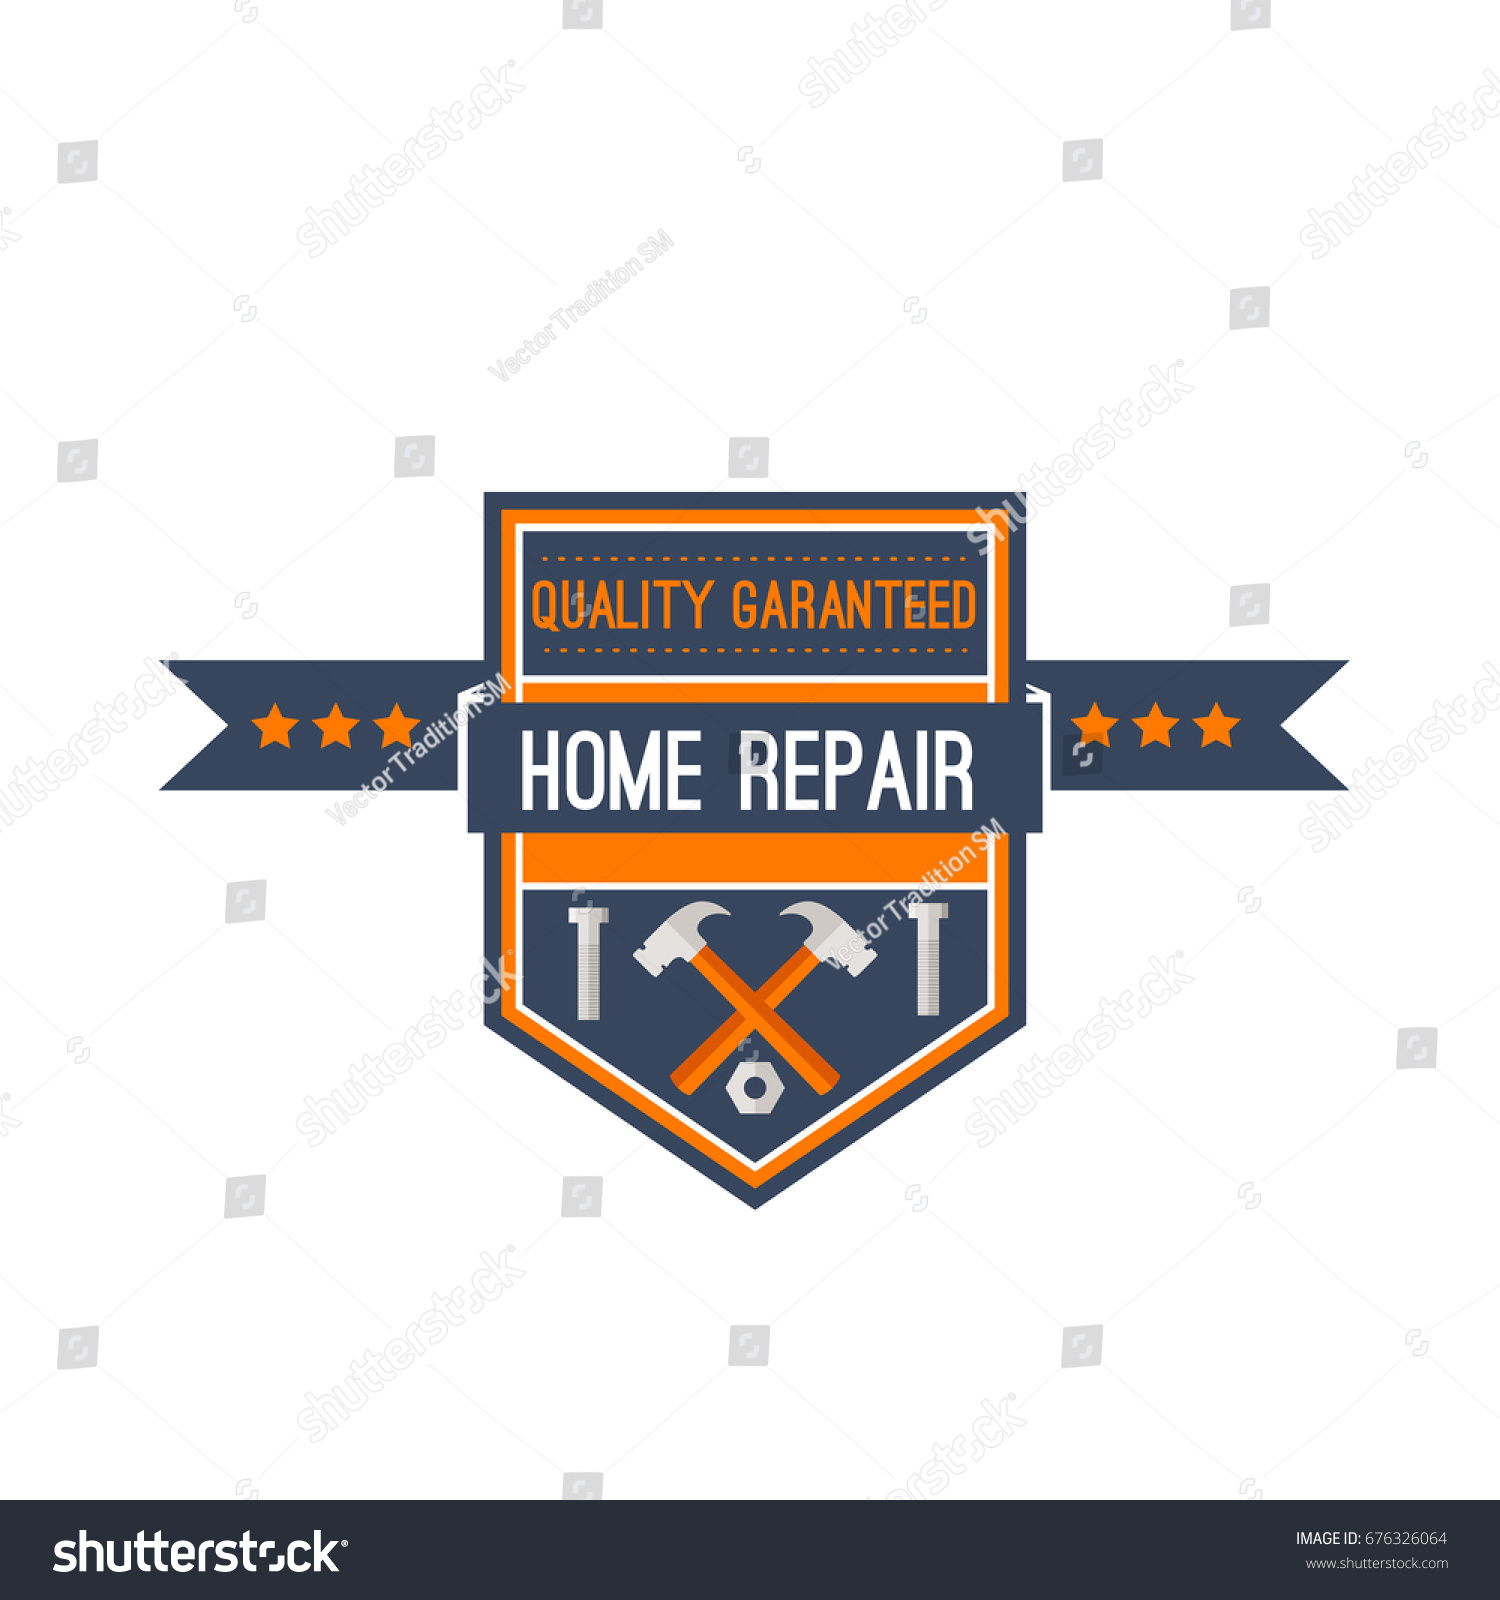 Home Design Repair Construction Company Icon Stock Vector 676326064 ...